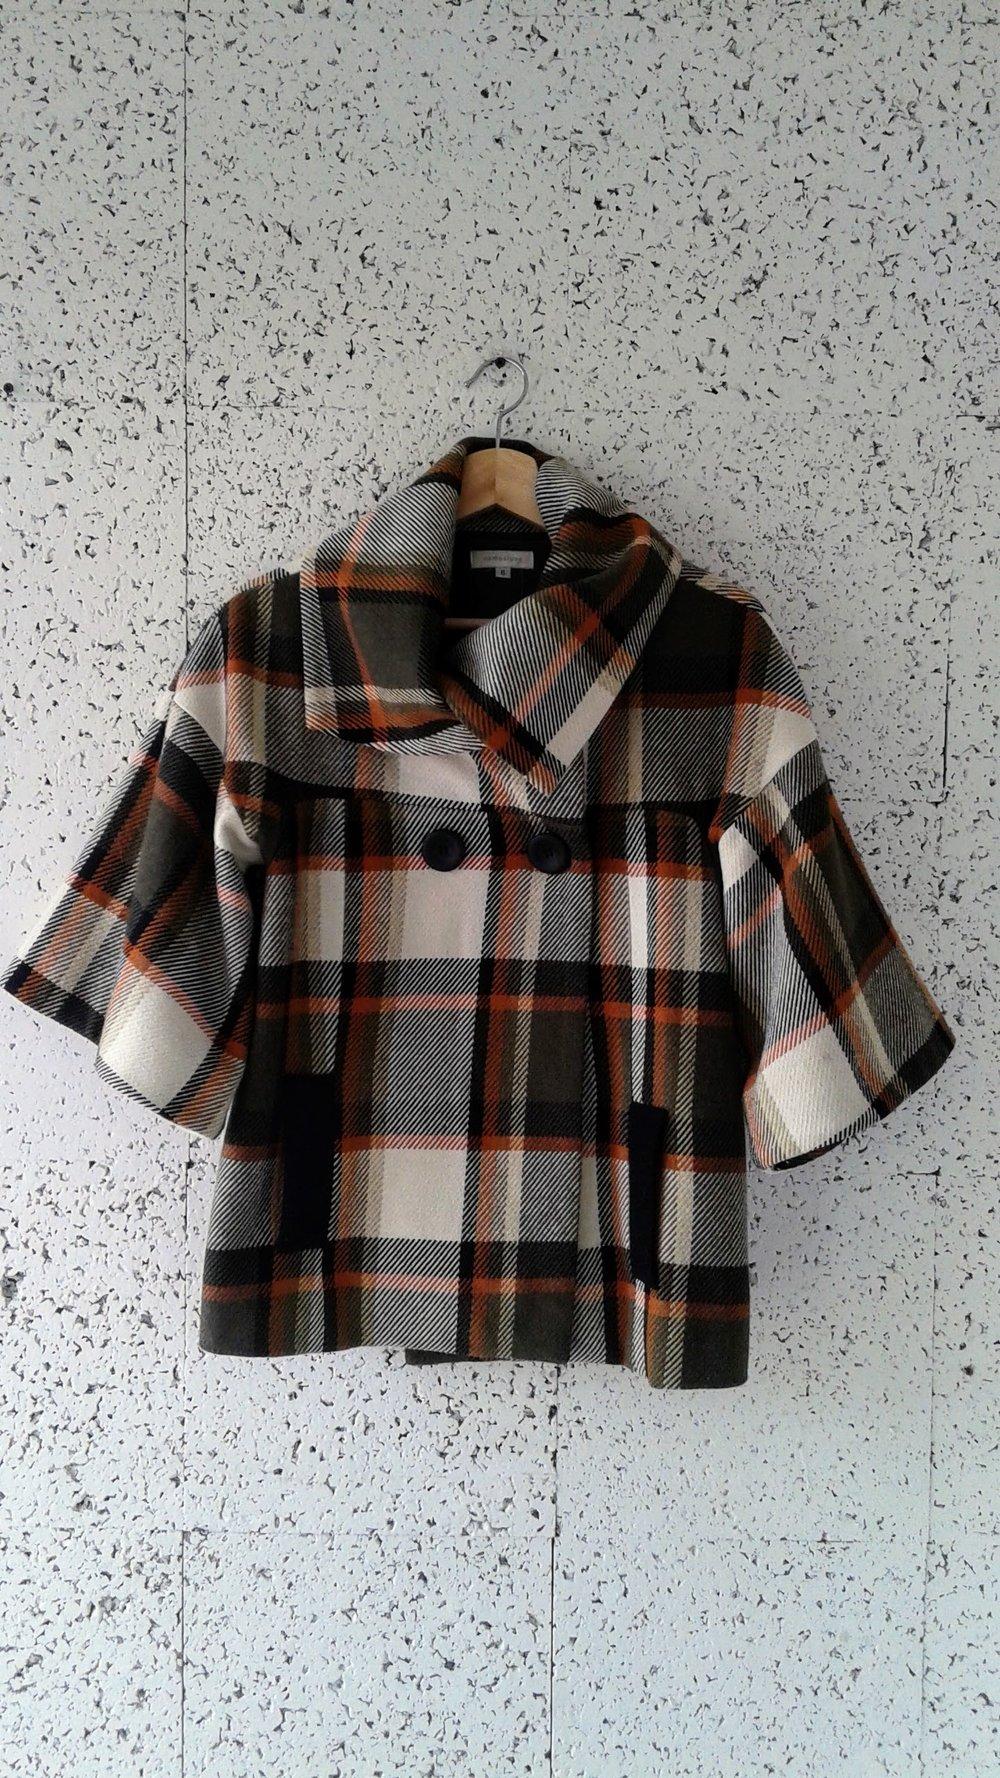 Campaigne coat; Size 6, $52